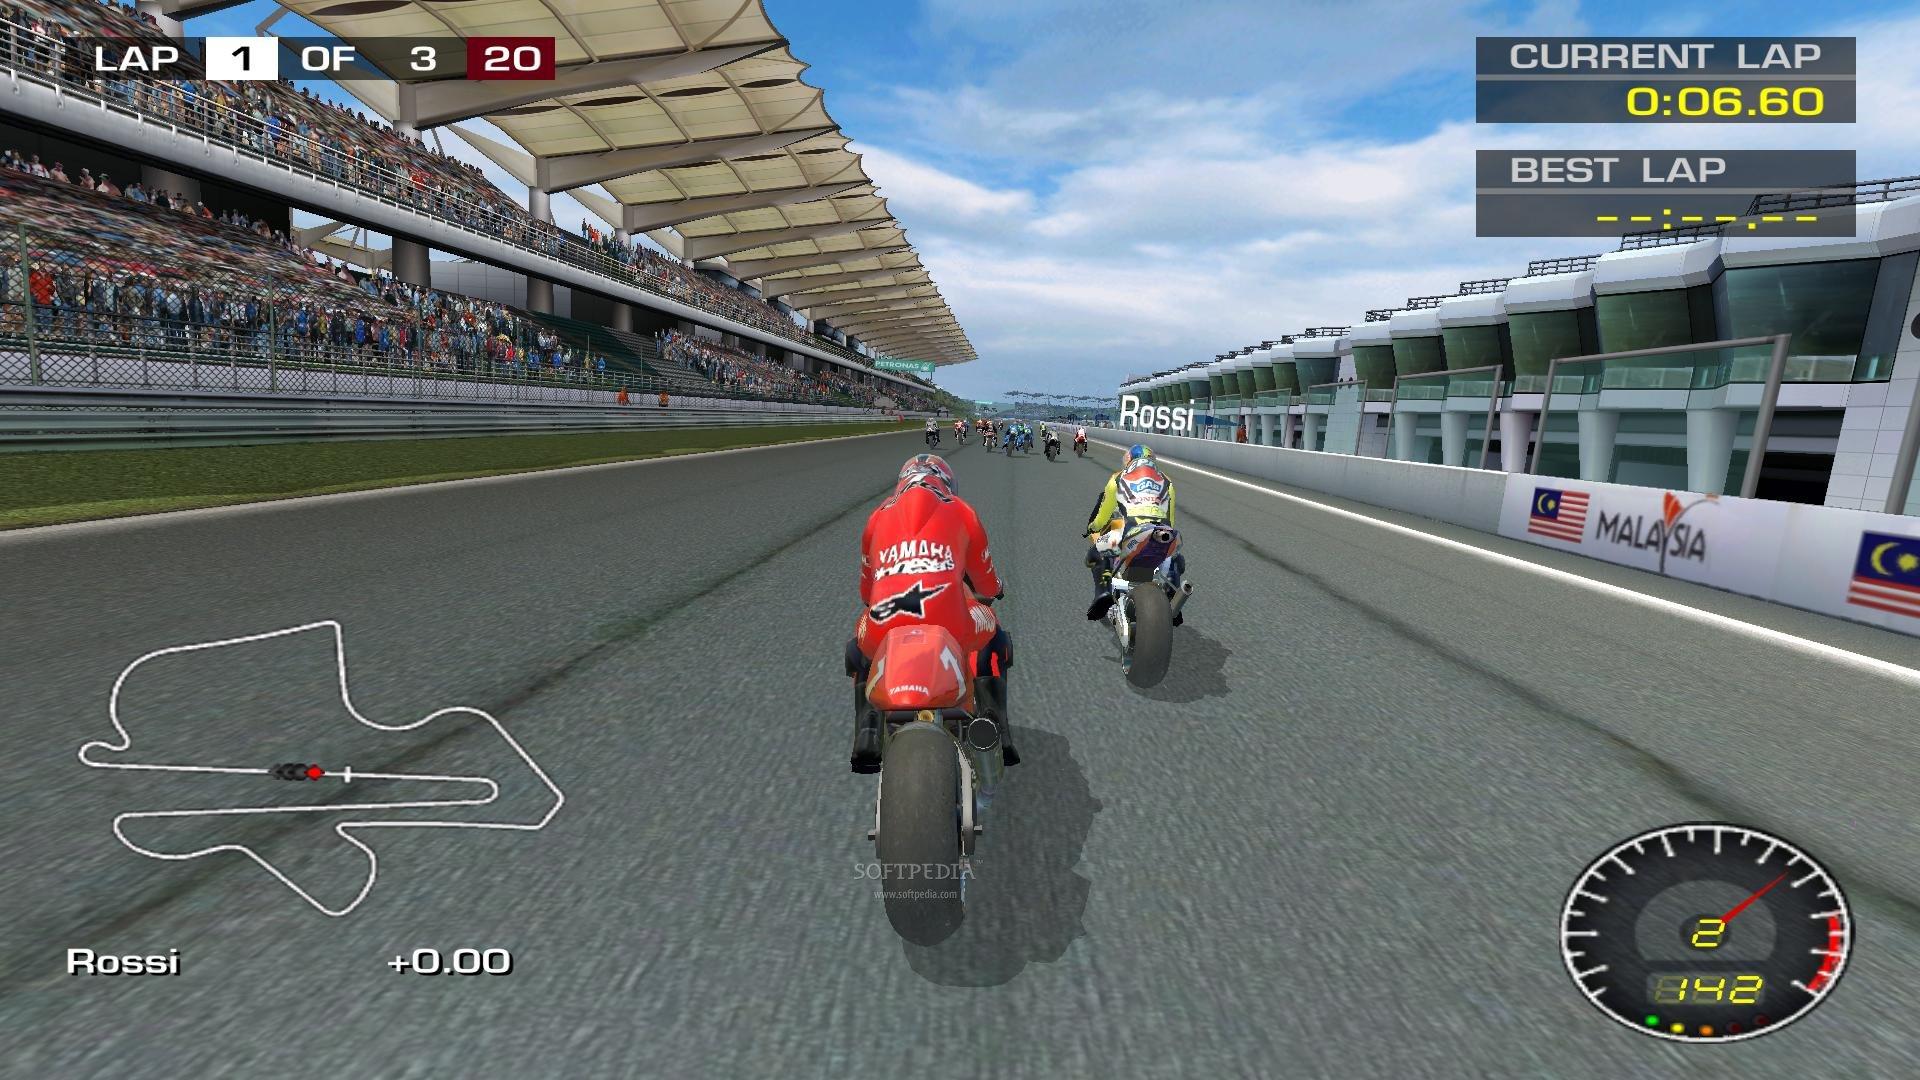 Motogp 2 demo game free download for pc genesis flash games